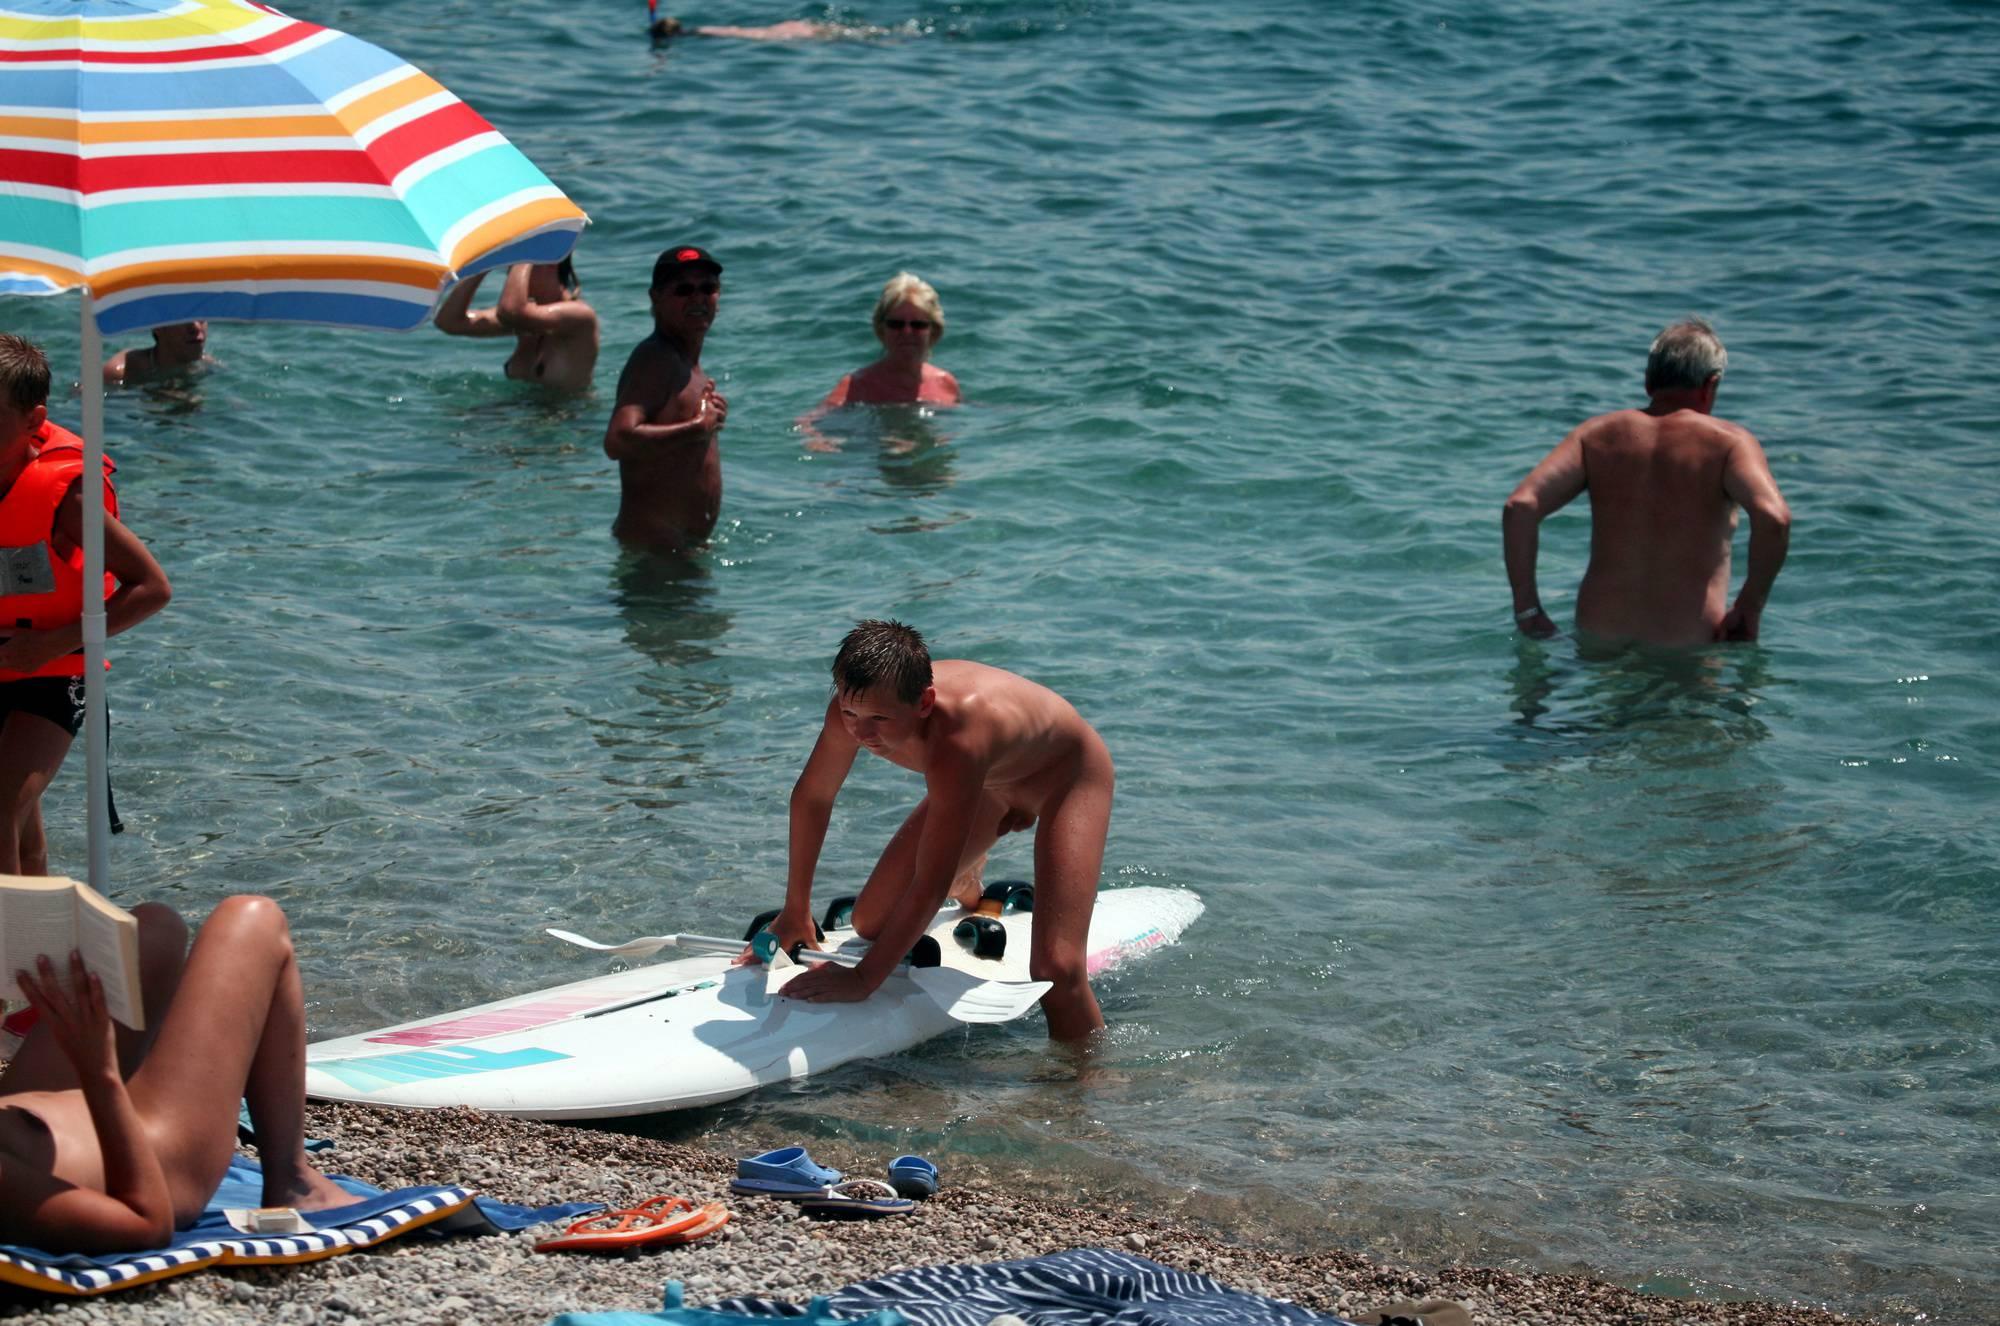 Nudist Photos Nudist Beach Boy Surfing - 2